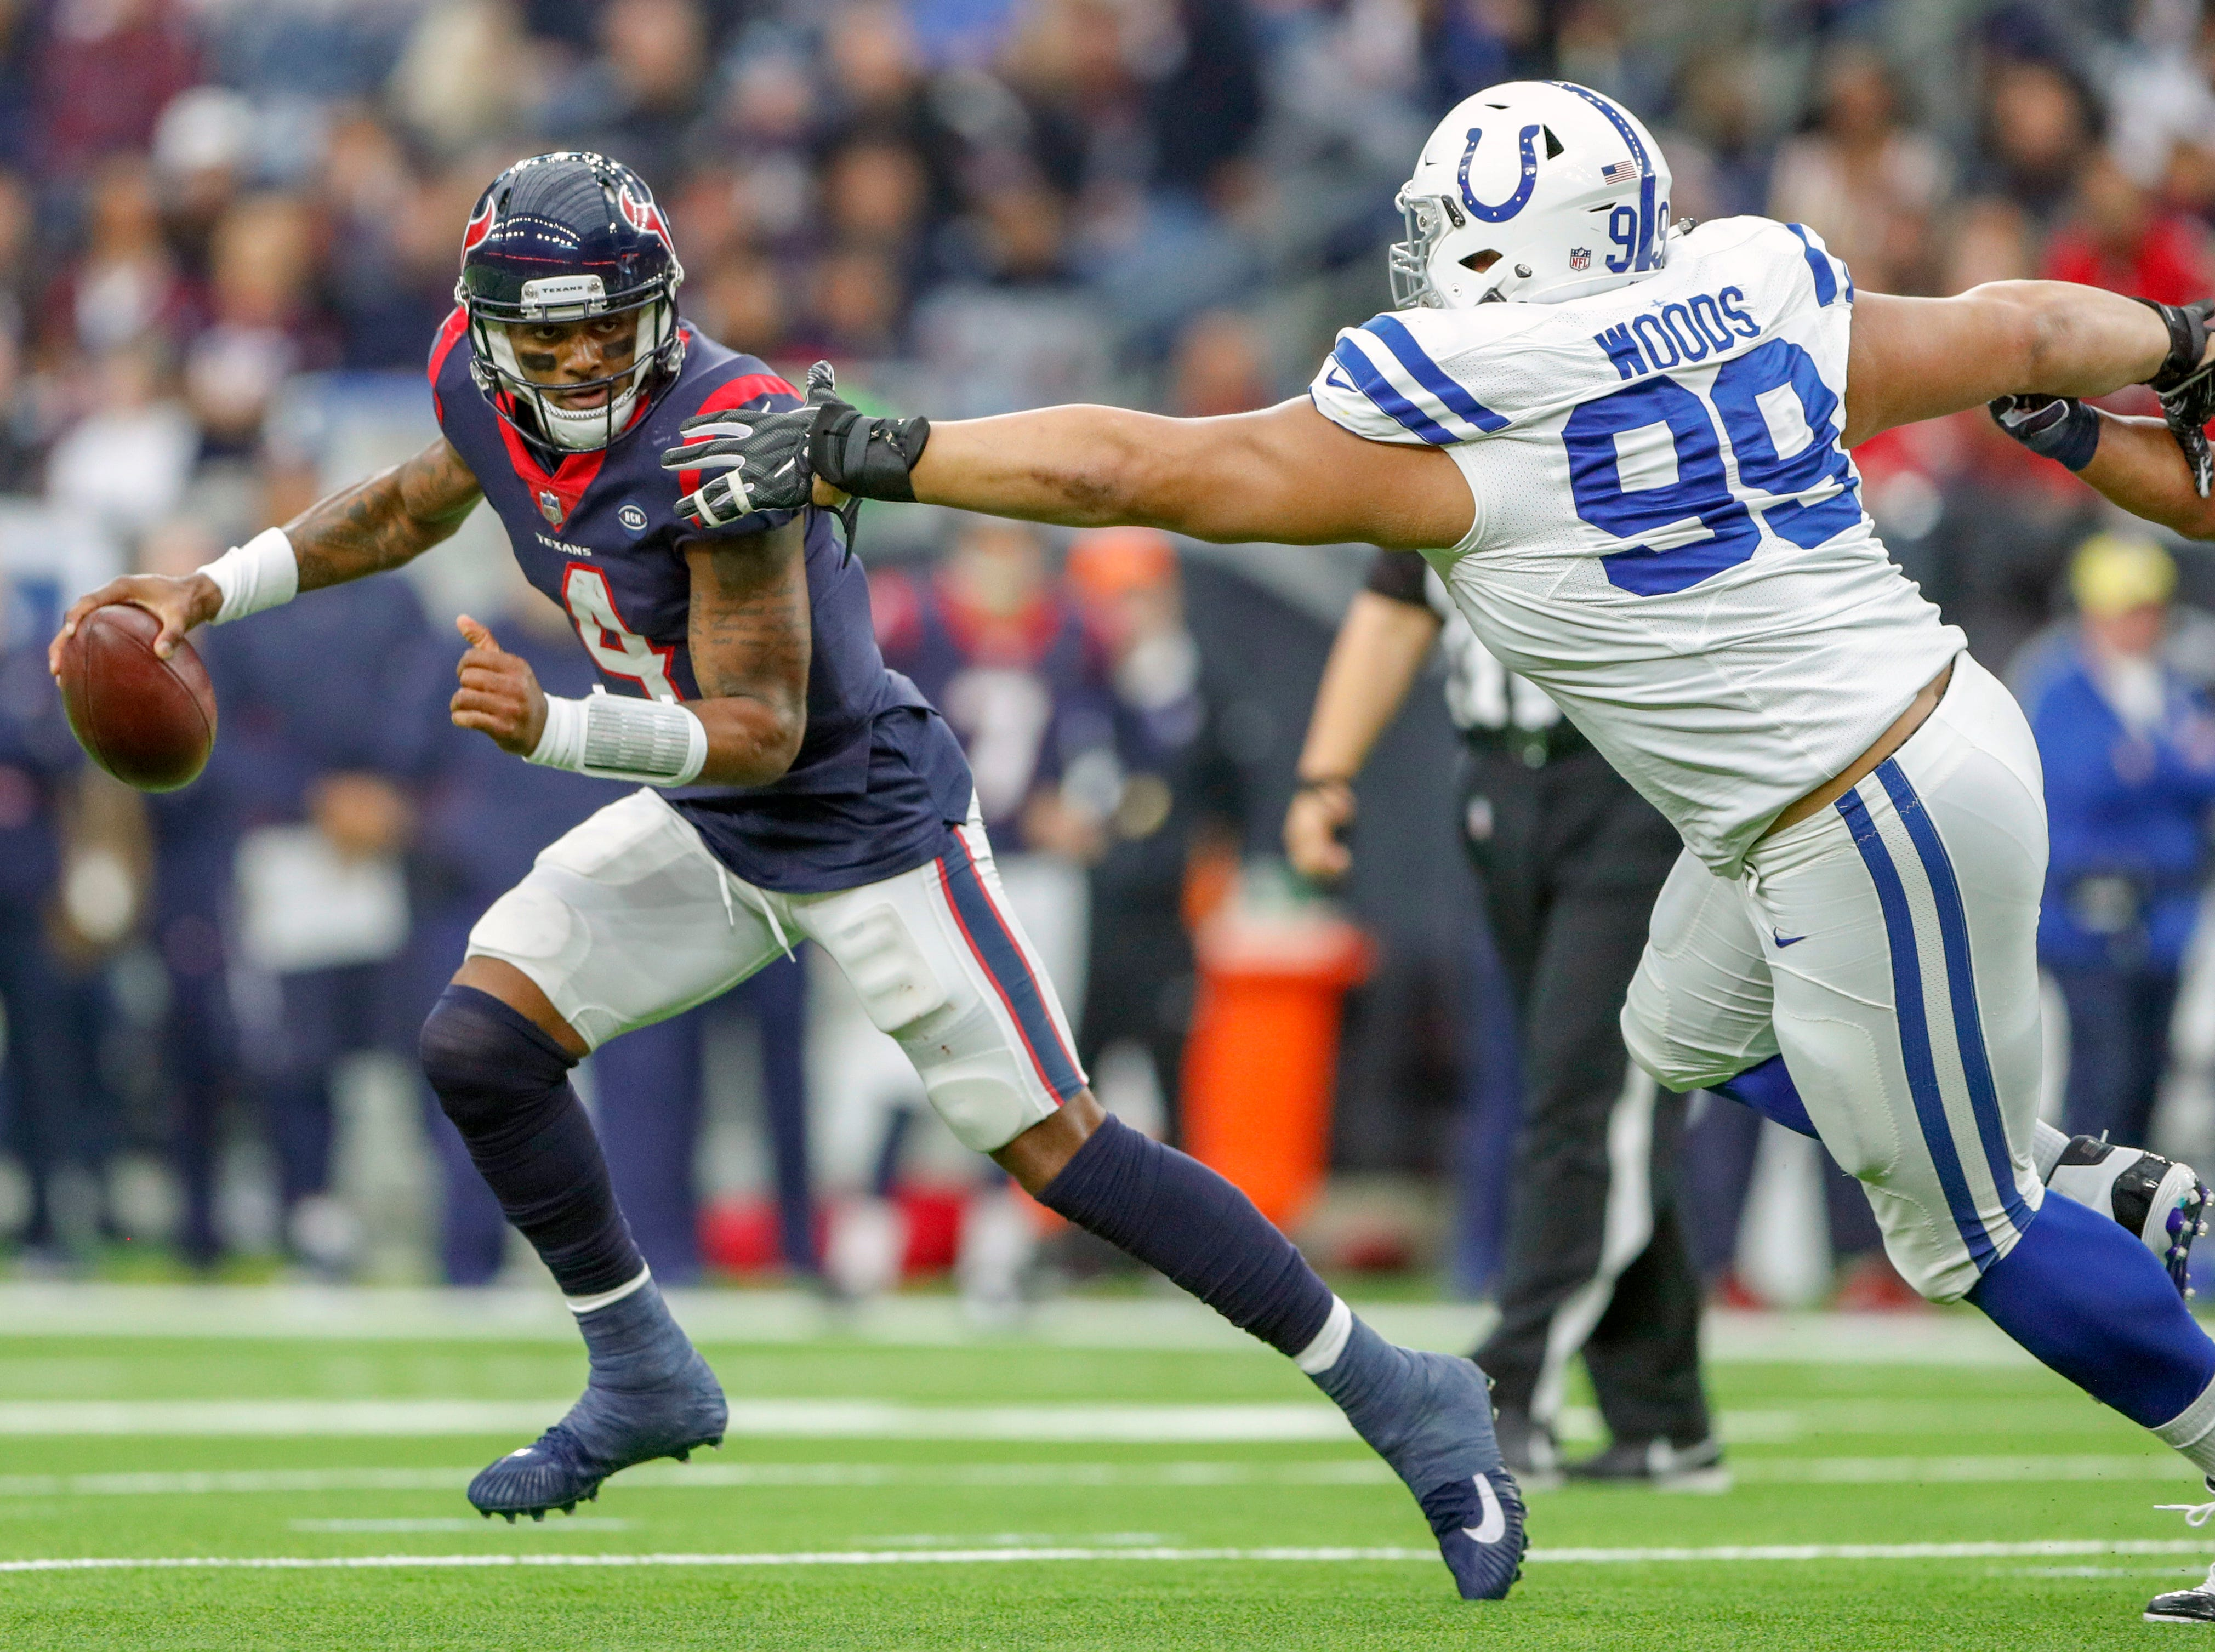 Indianapolis Colts defensive tackle Al Woods (99) pressures Houston Texans quarterback Deshaun Watson (4) in the third quarter at NRG Stadium in Houston on Sunday, Dec. 9, 2018.